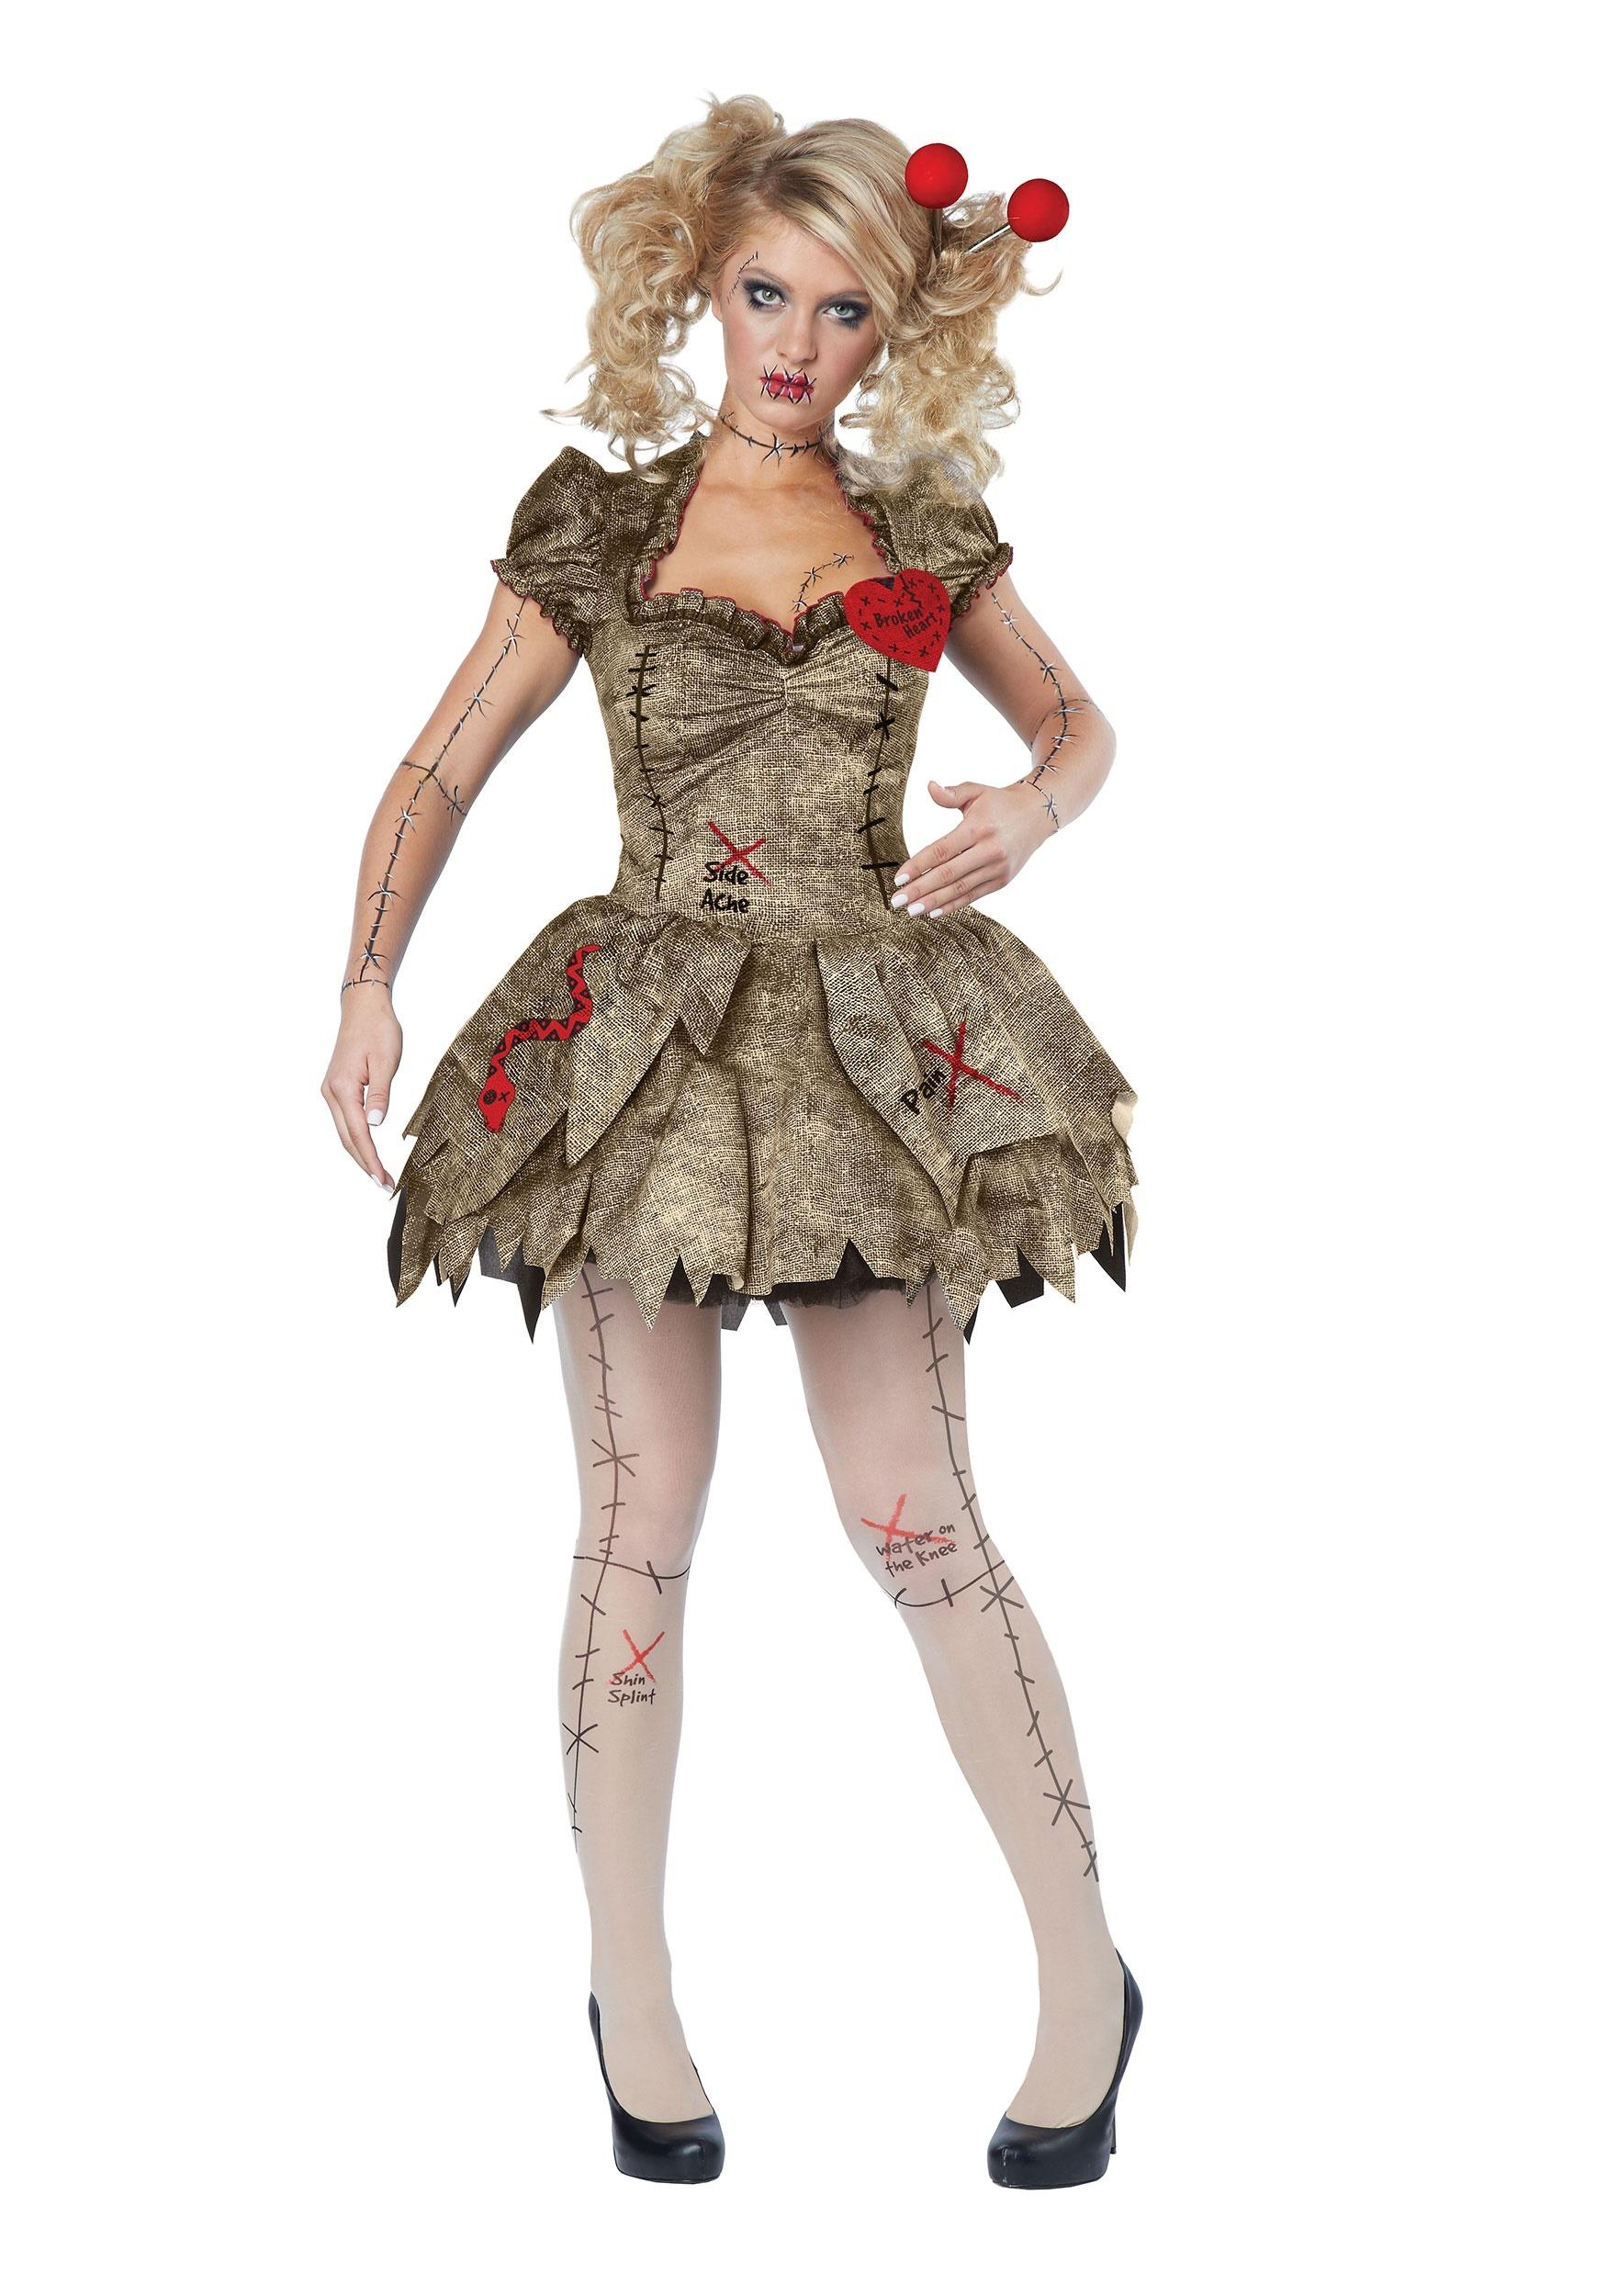 Voodoo Dolly Women's Costume